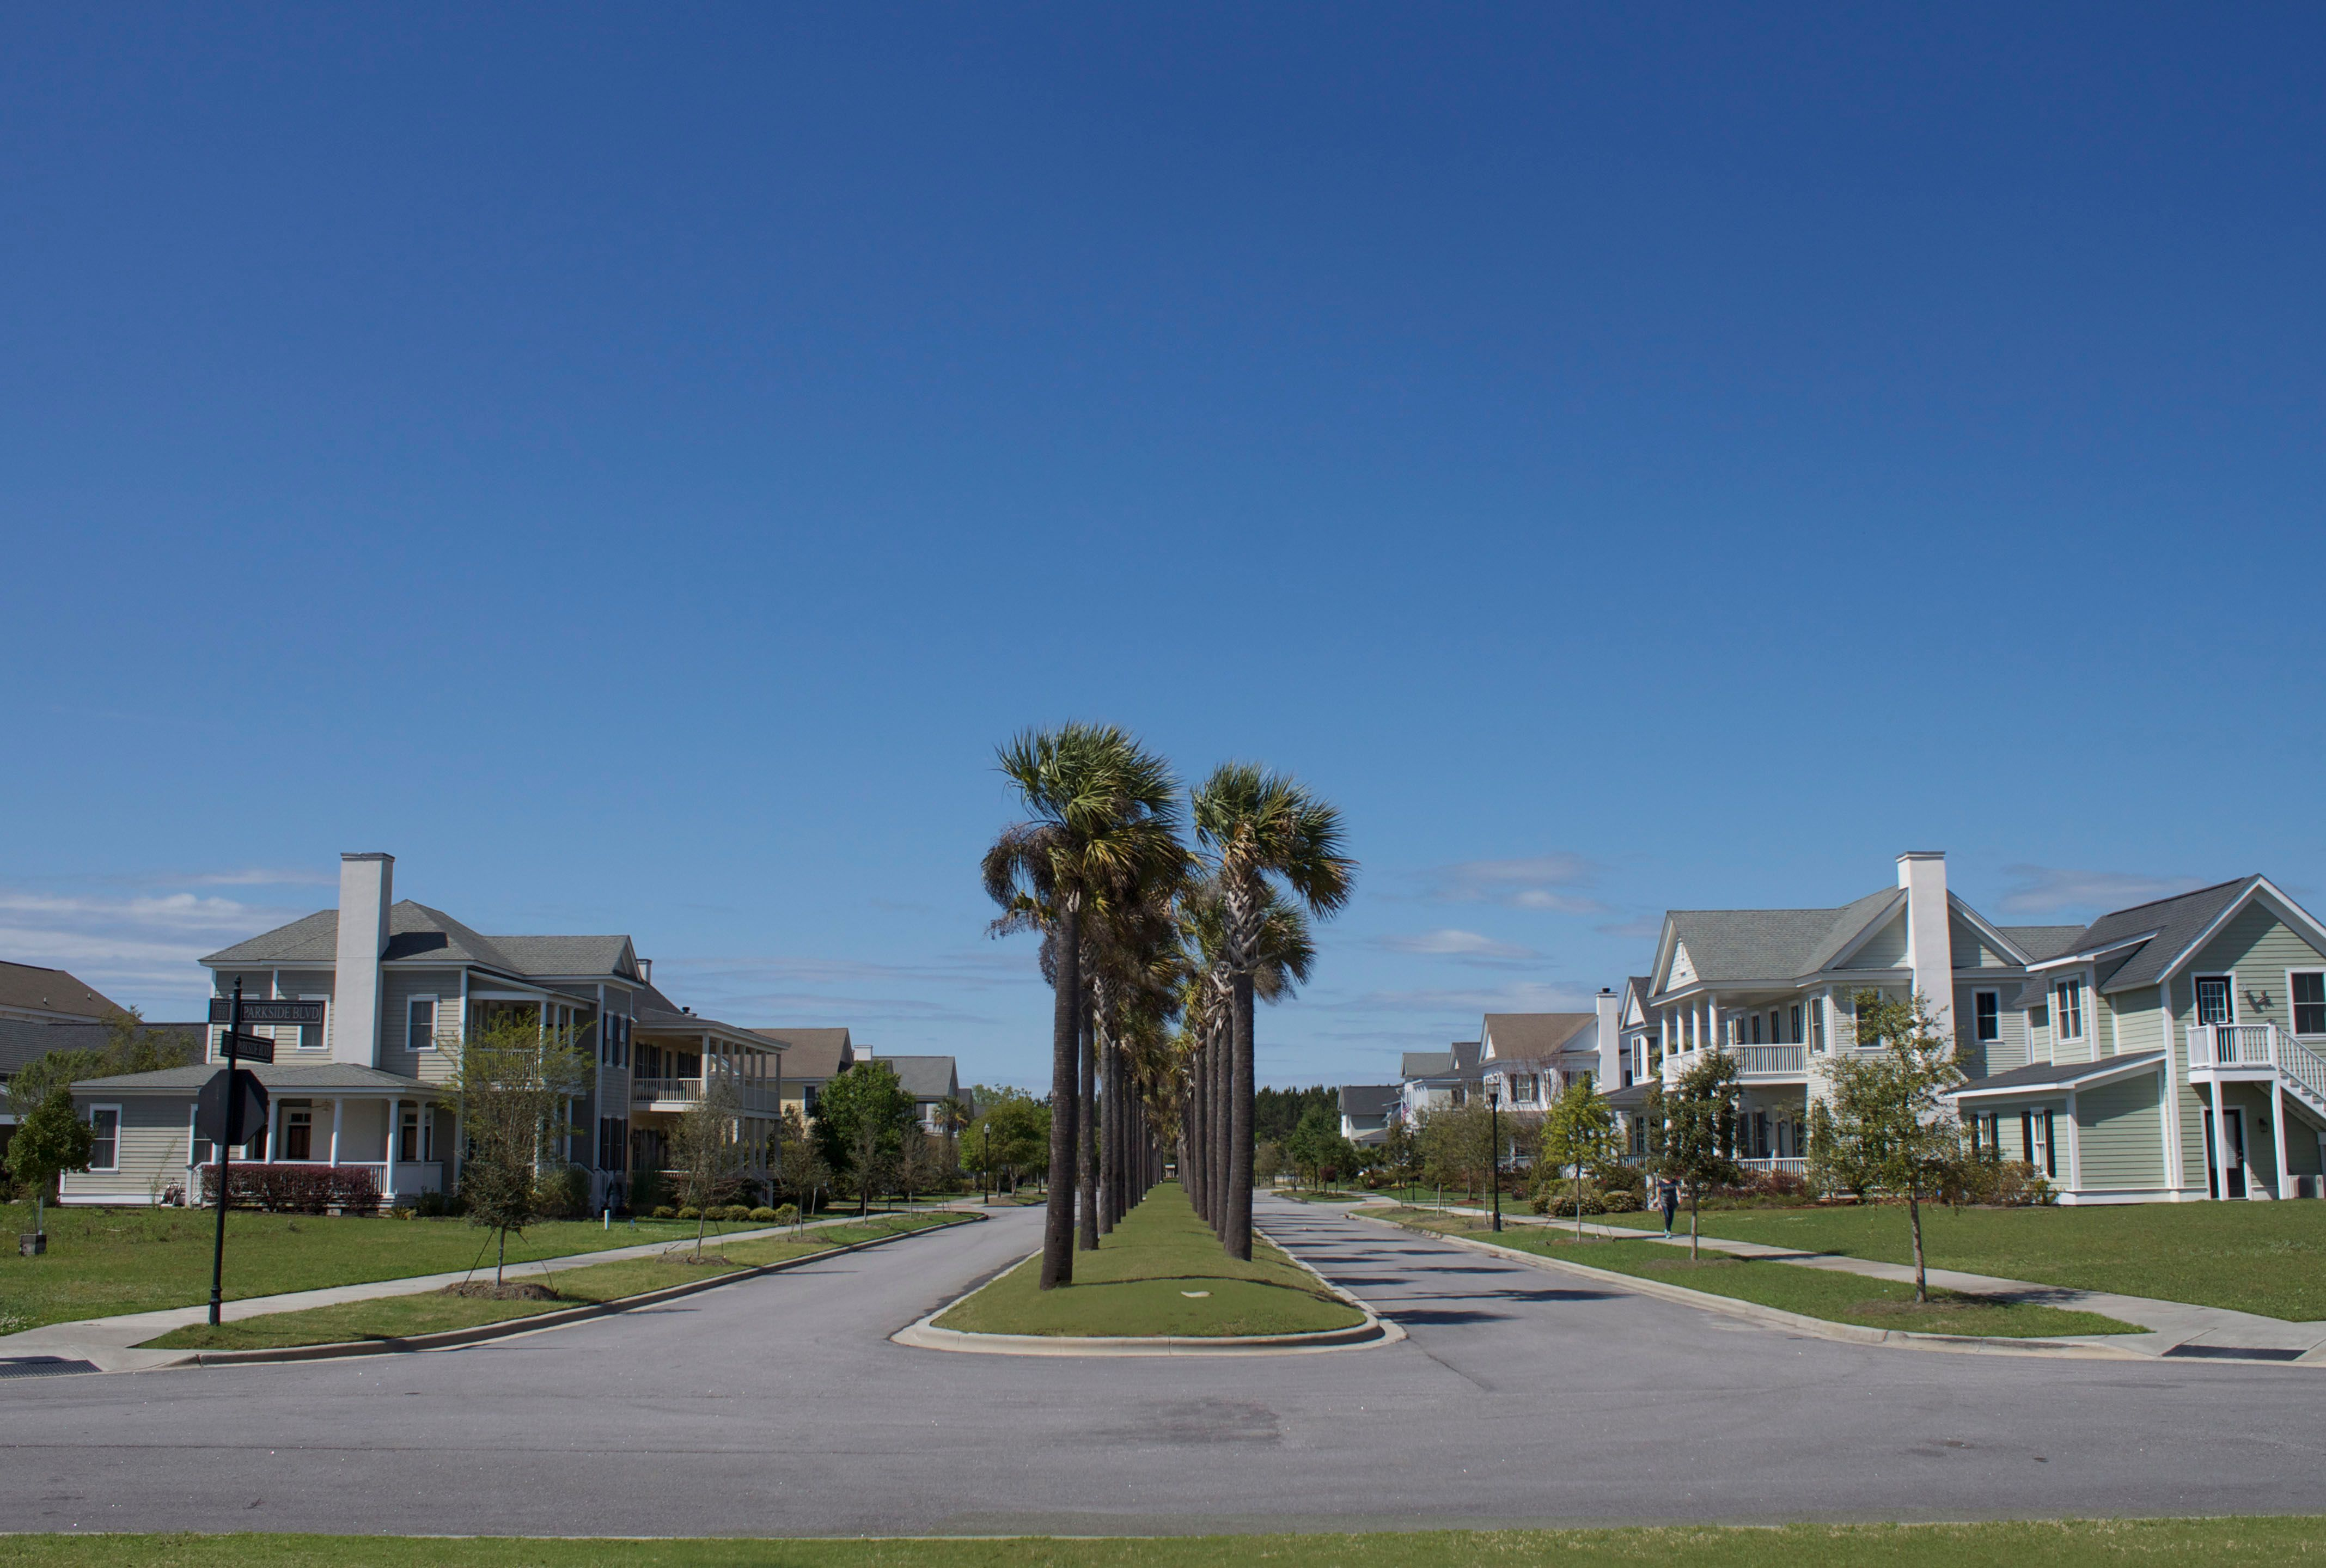 'Rice Hope' by Village Park Homes in Savannah